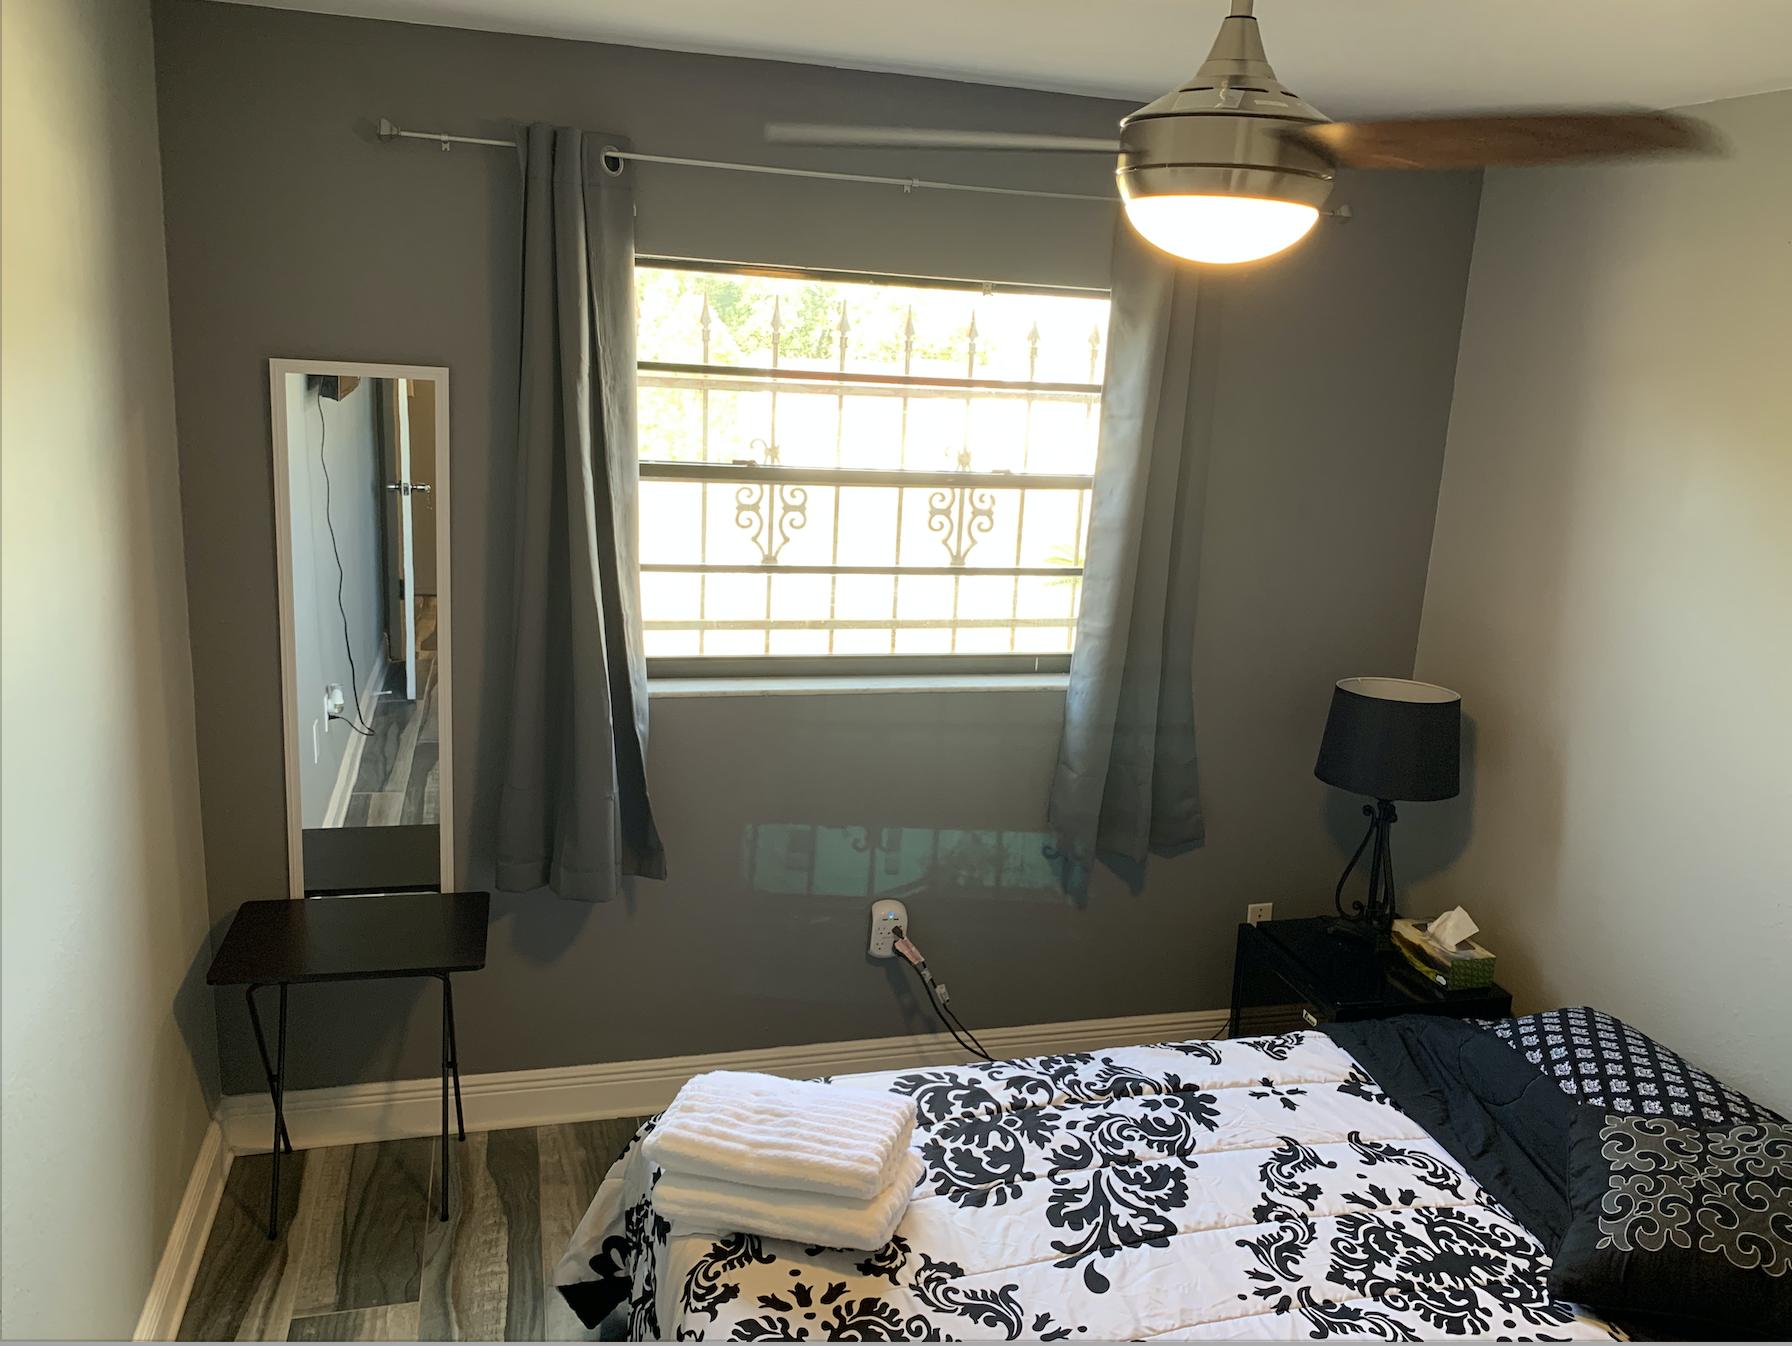 Apartment 3 Bedroom House photo 16947320